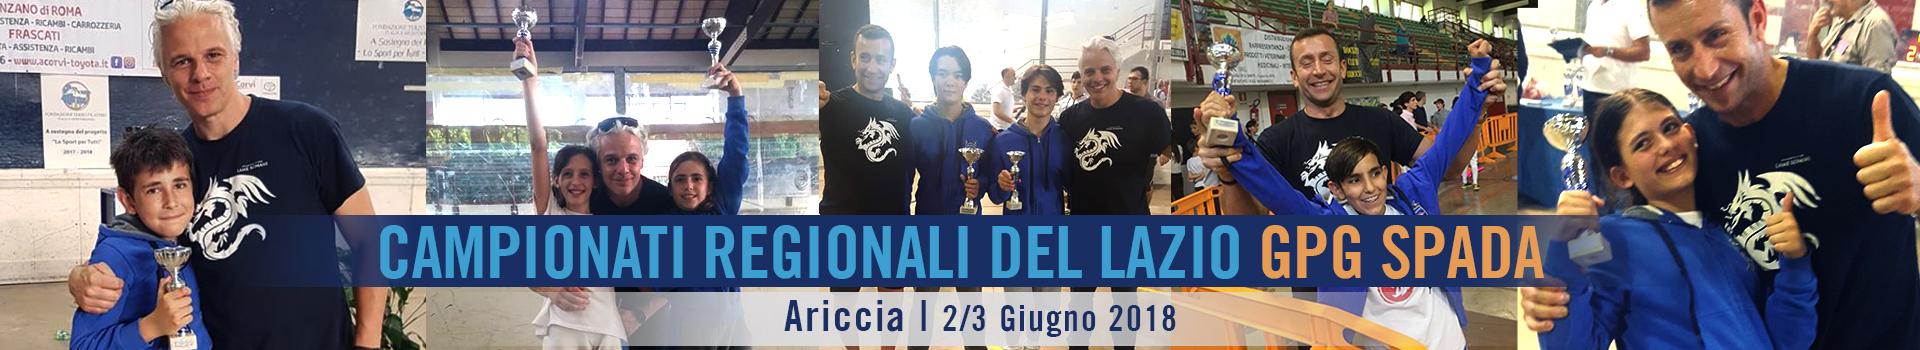 11_Palariccia-Spada-Giugno-2019